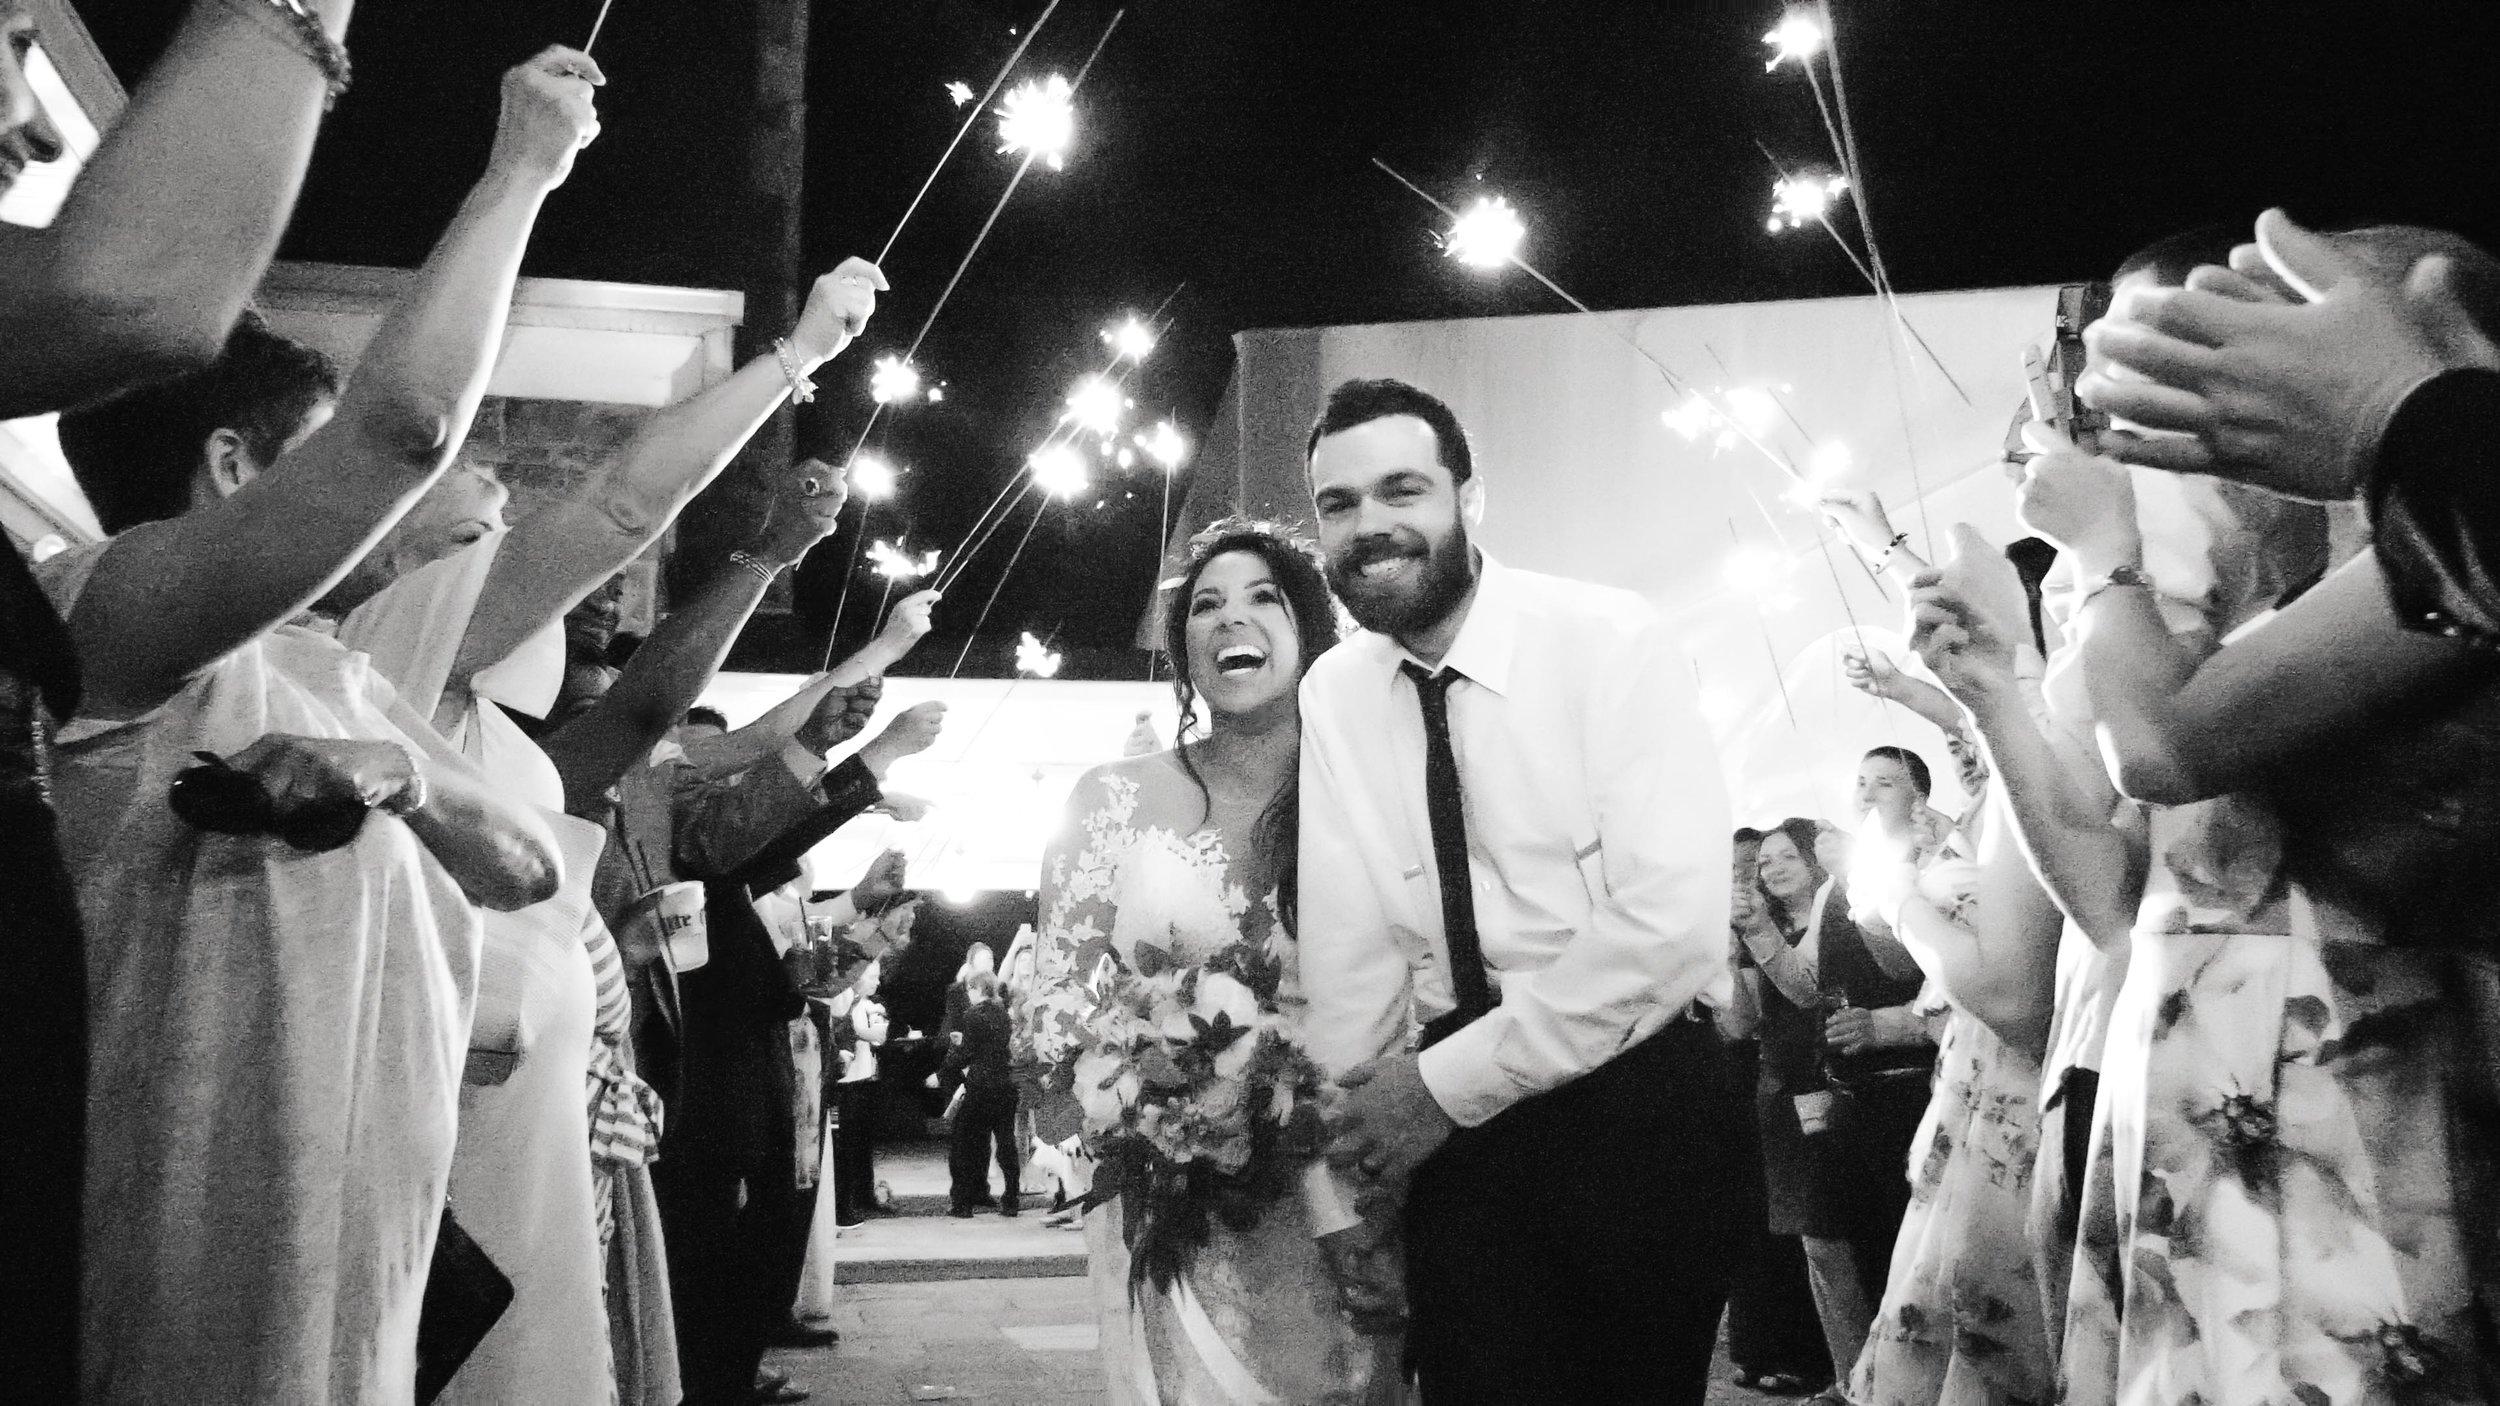 Tonemedia, NJ Wedding Videographer, NJ Wedding Videopgraphy, NJ Wedding Video, The Architects Golf Club,The Architects Golf Club Wedding,Architects Golf Club Wedding Video